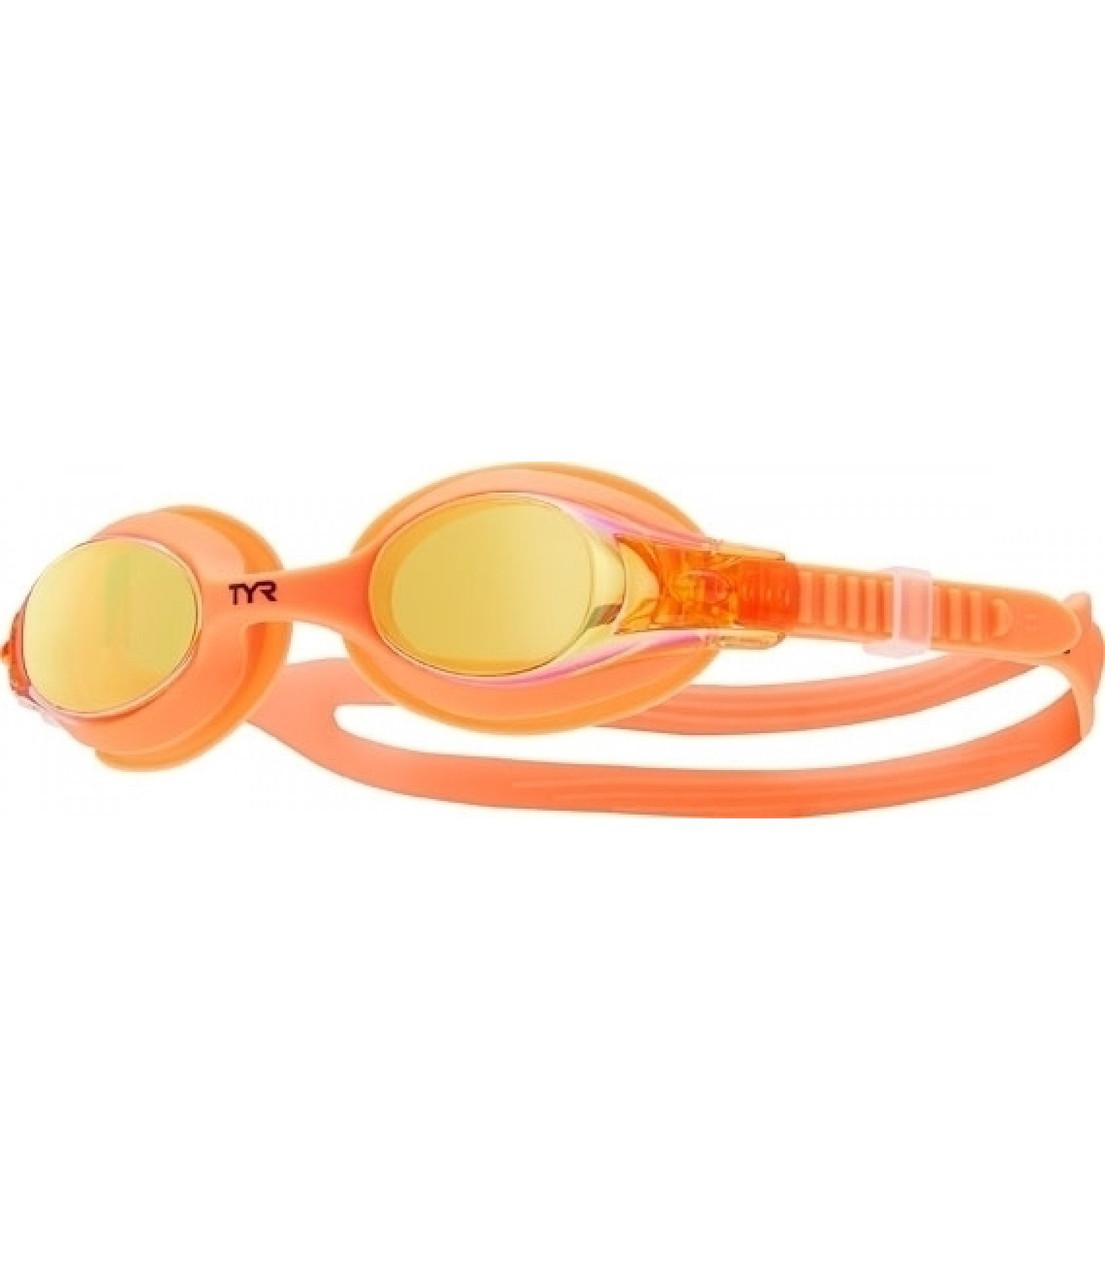 Очки для плавания детские TYR Swimple Mirrored 841